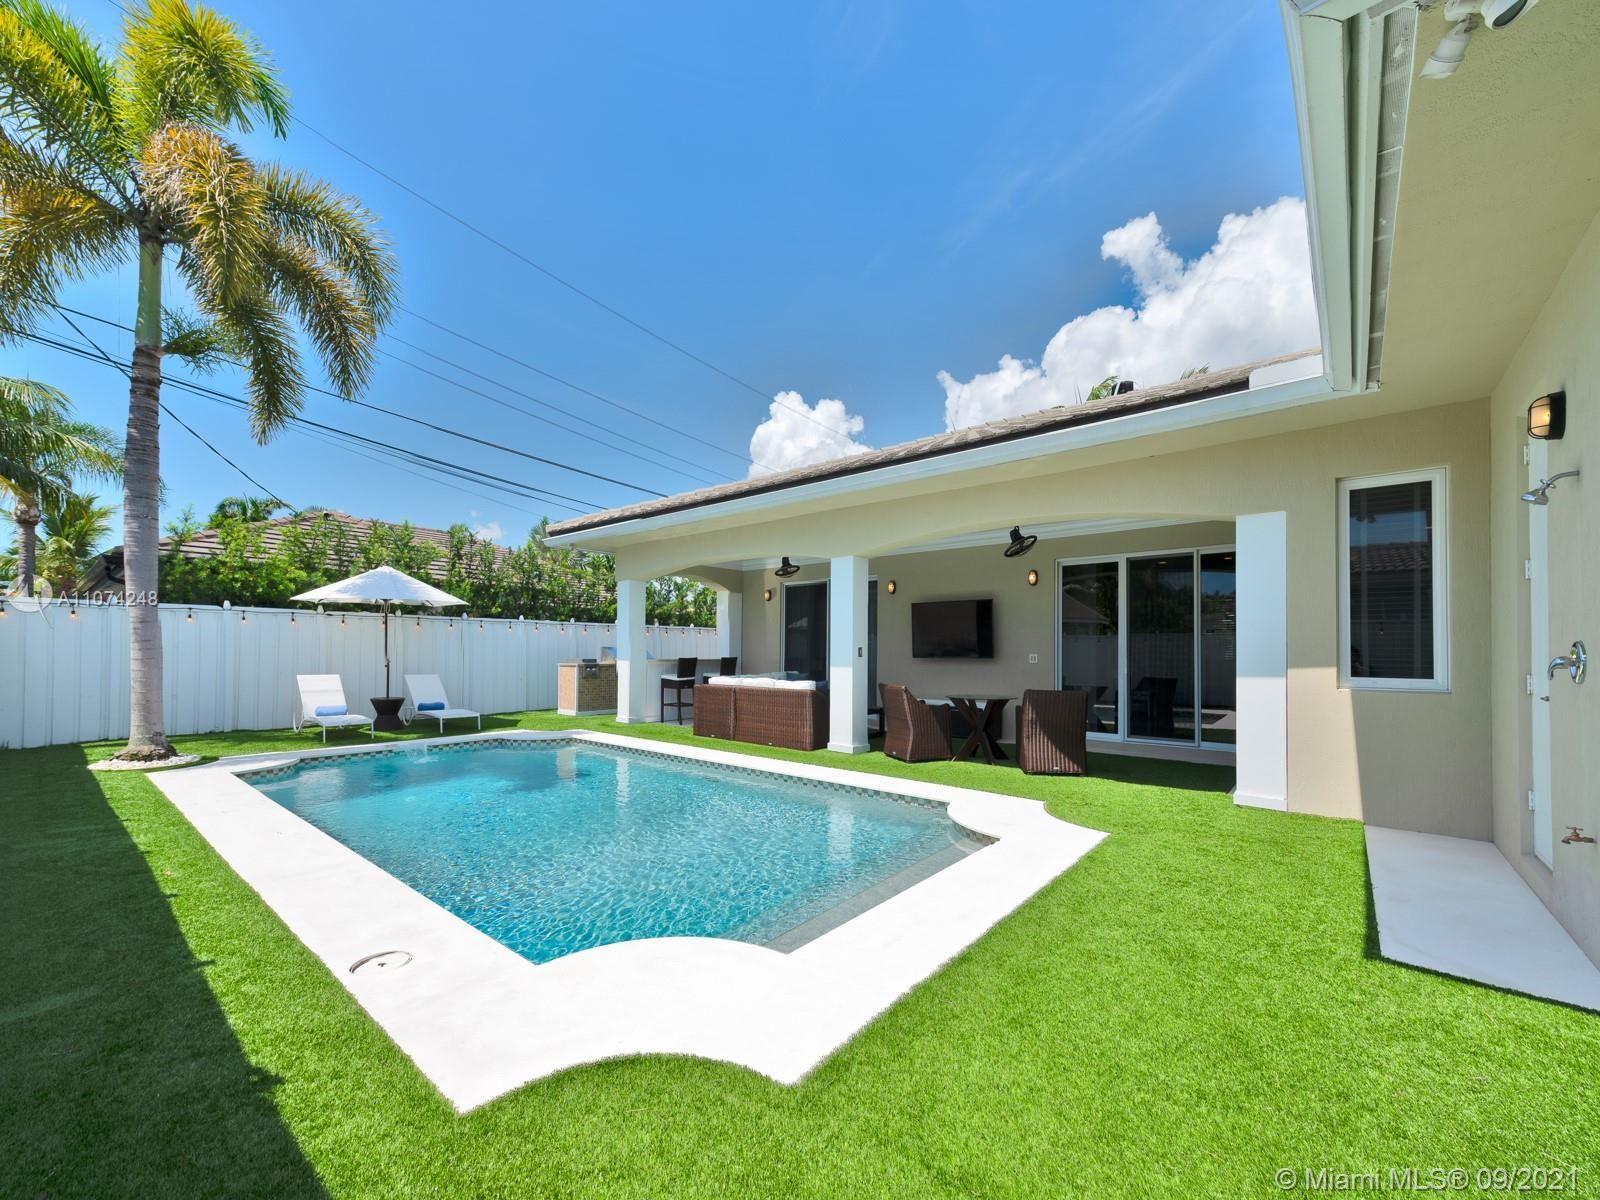 254 Corsair Ave, Lauderdale by the Sea, FL 33308 - #: A11074248